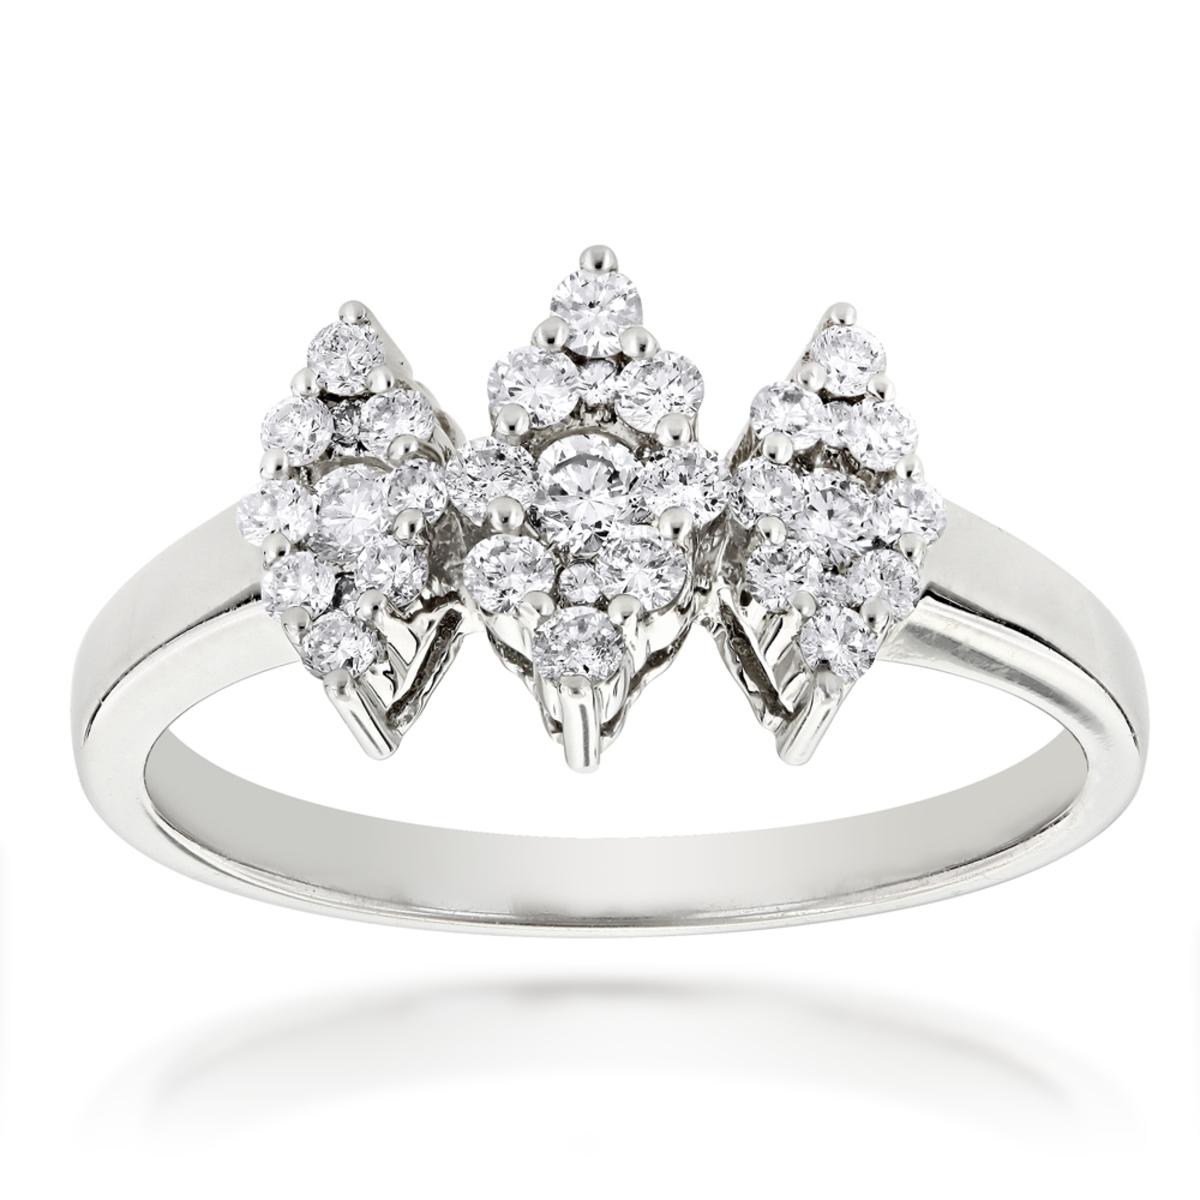 14K Gold Ladies Cluster Diamond Ring 0.63ct Three Stone Ring Design